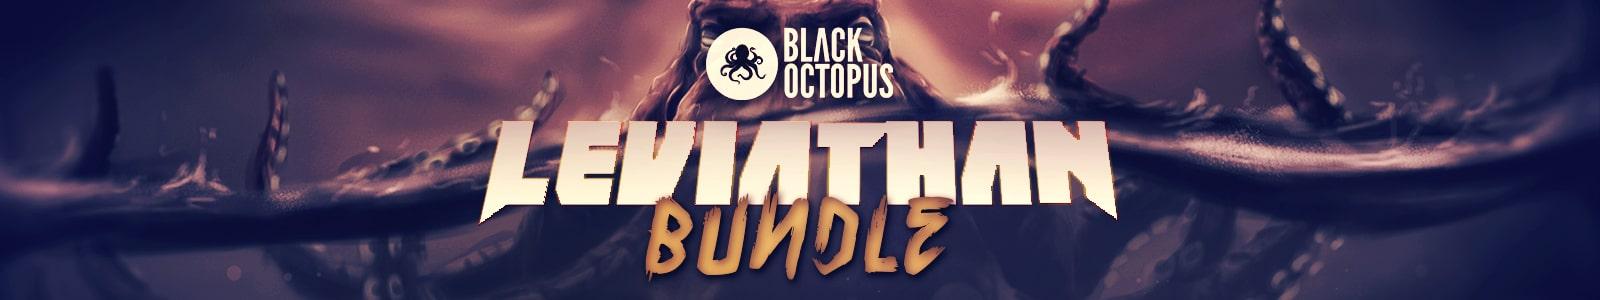 black octopus leviathan bundle